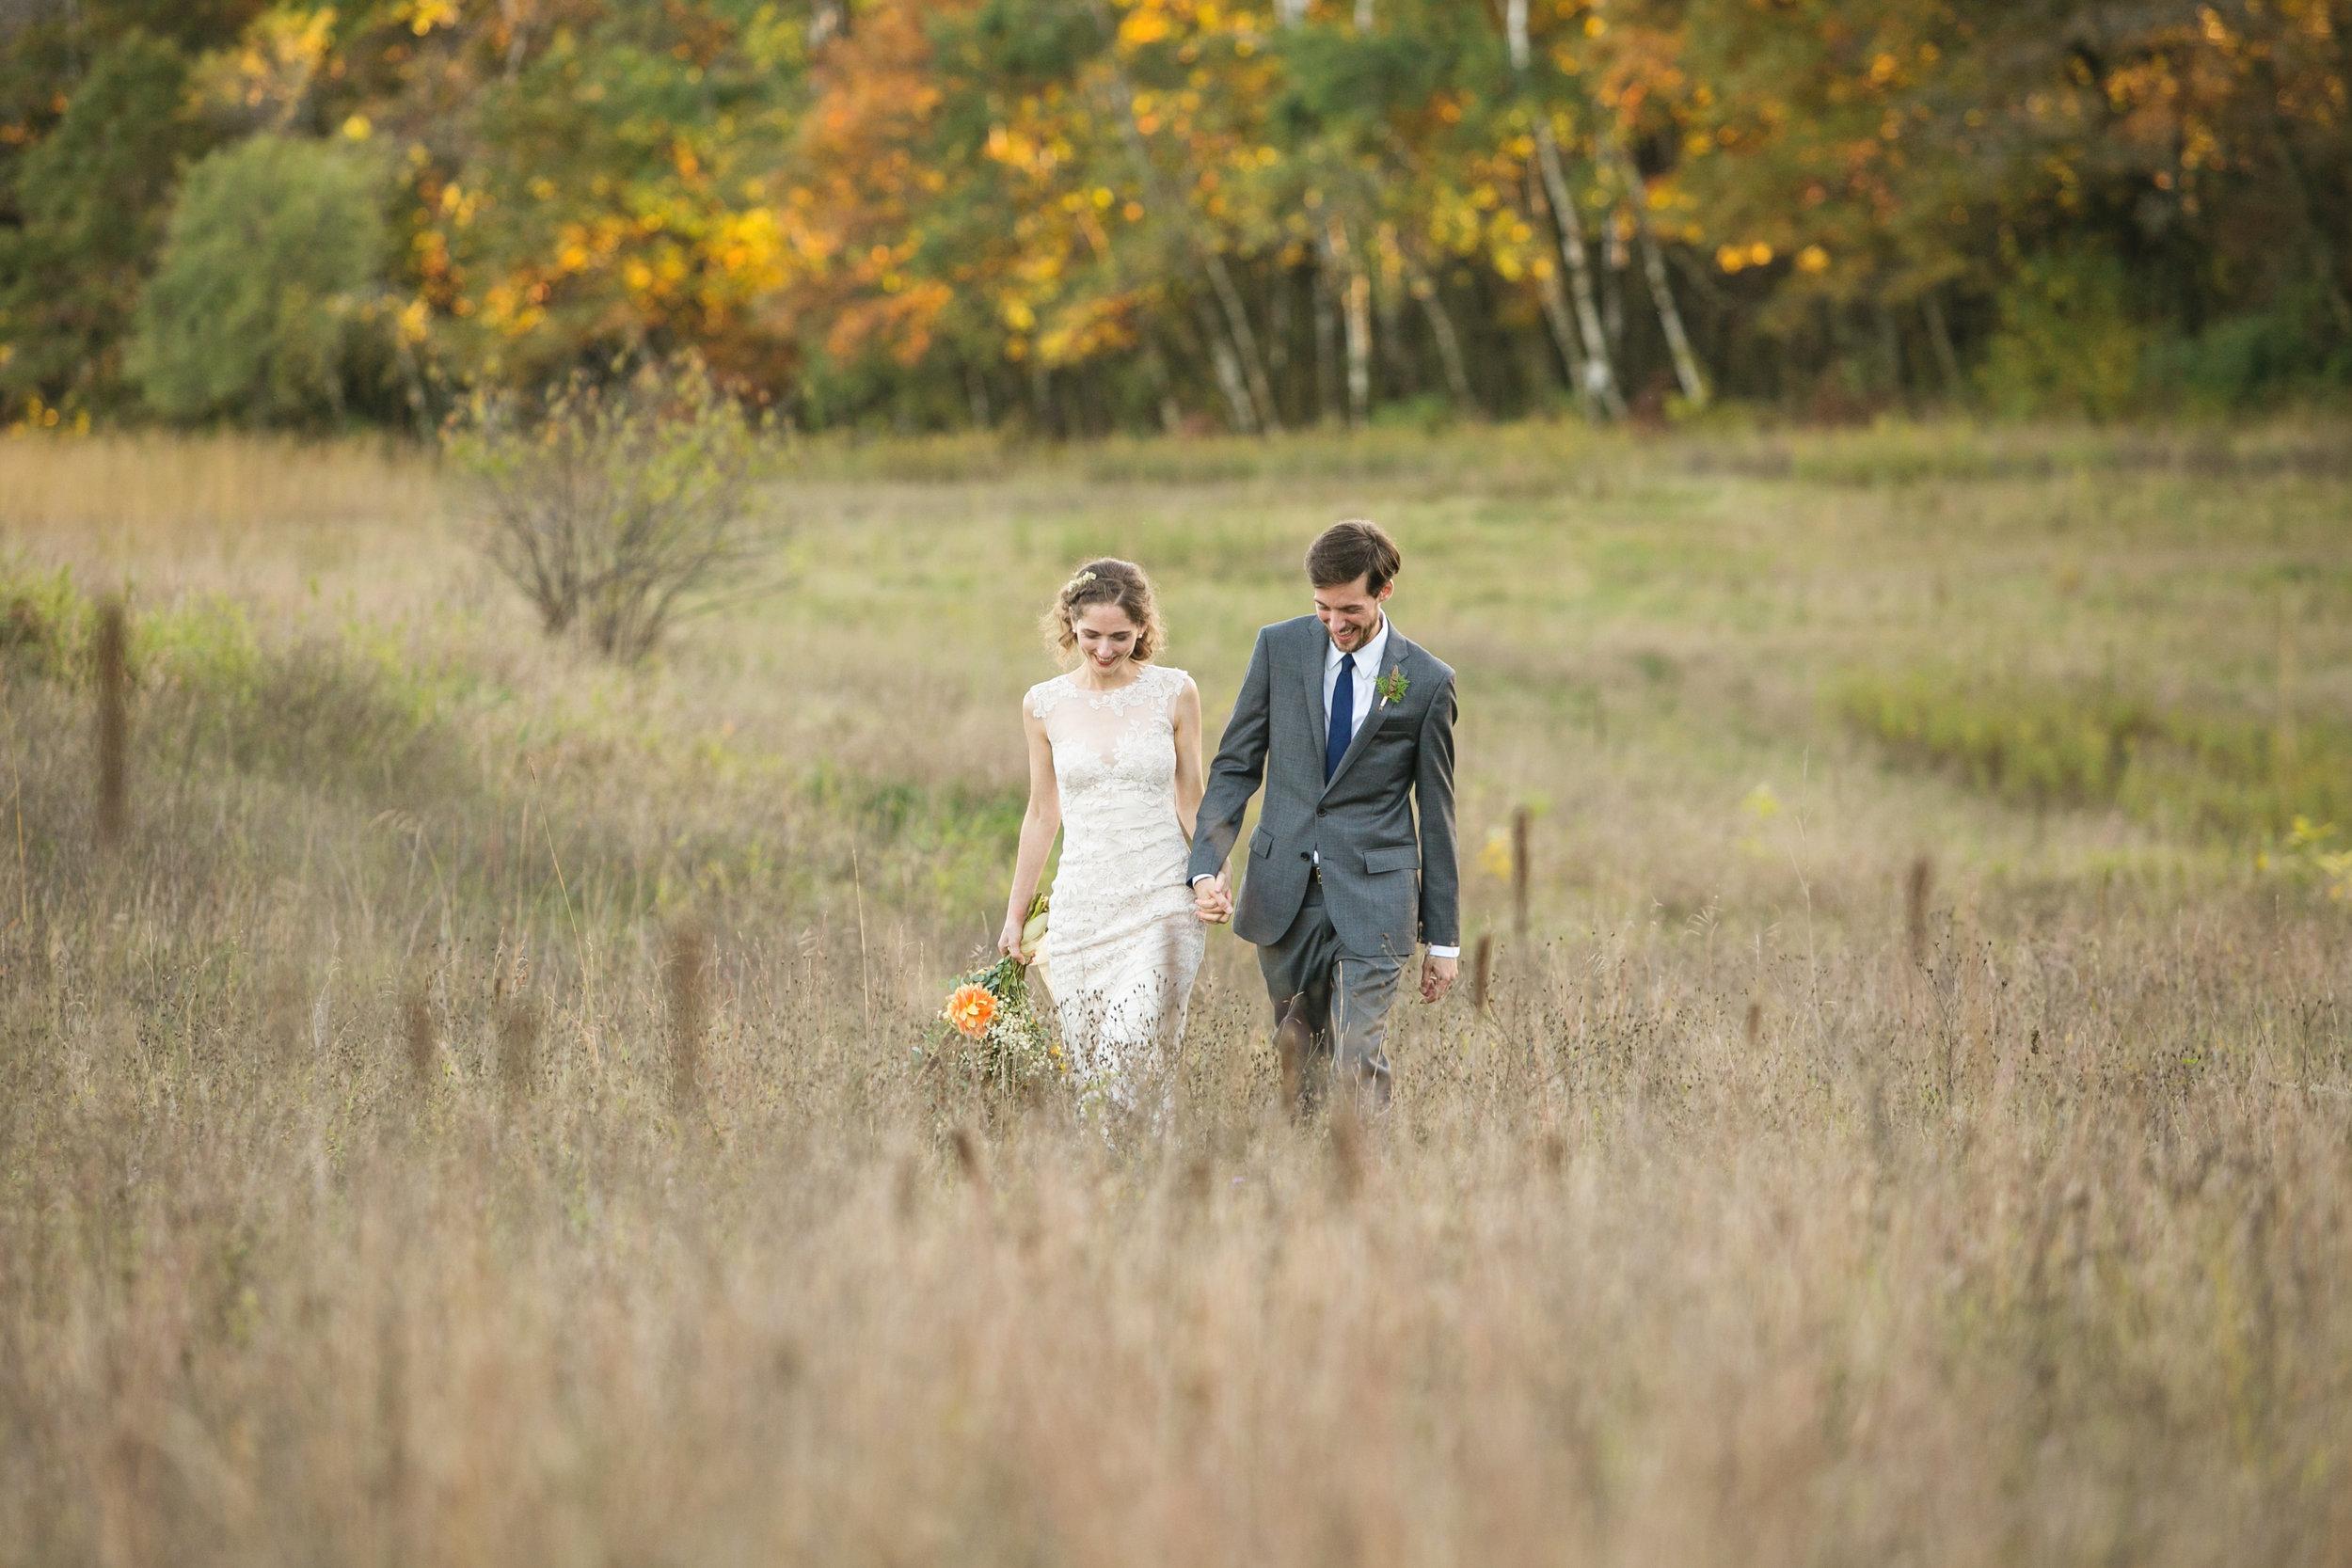 Stillwater_MN_Wedding_Photographer_49.jpg